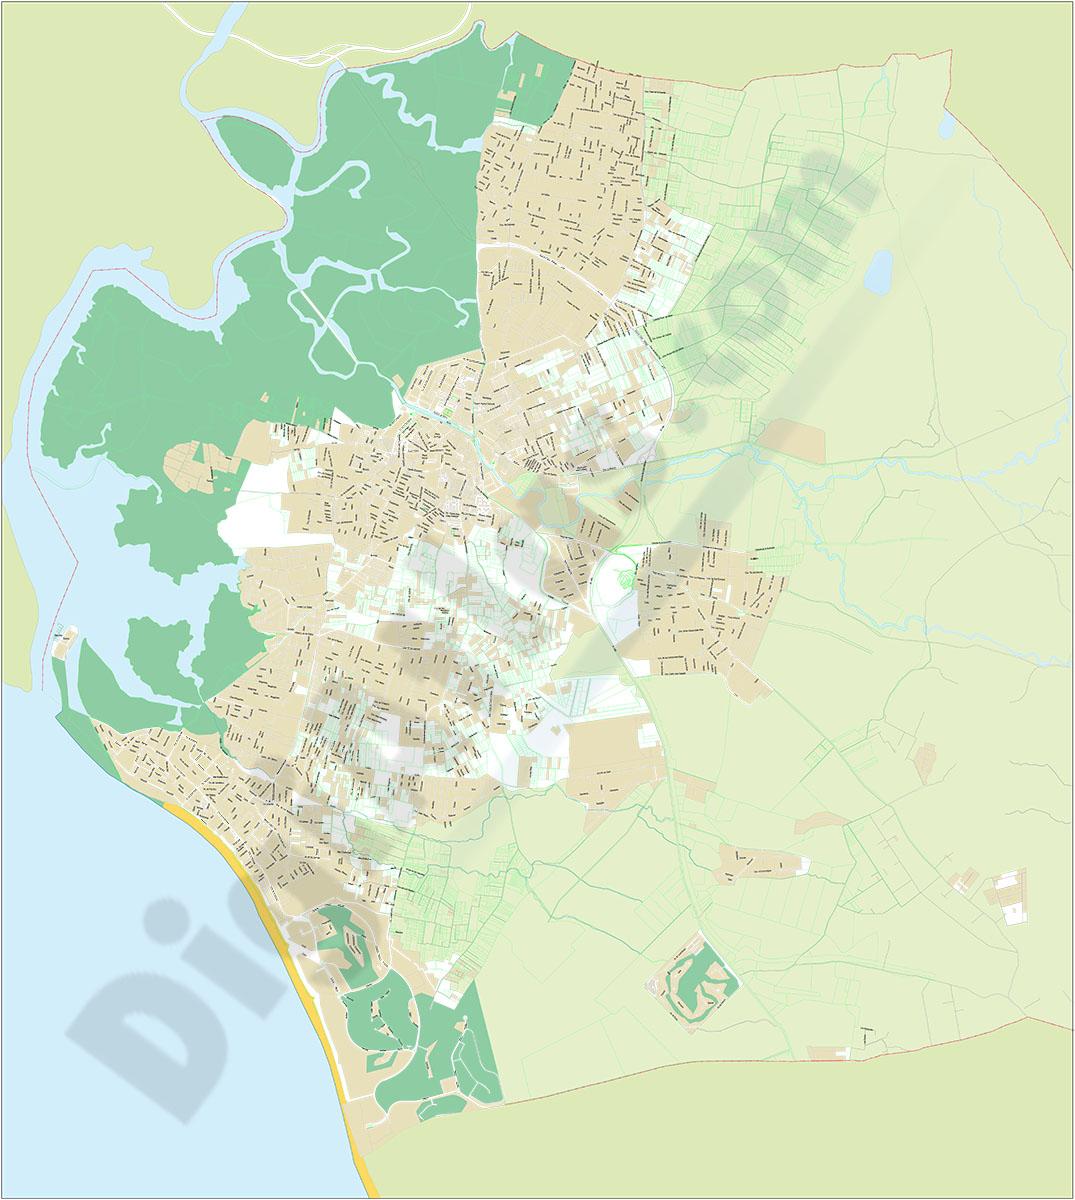 Chiclana de la Frontera - Plano callejero